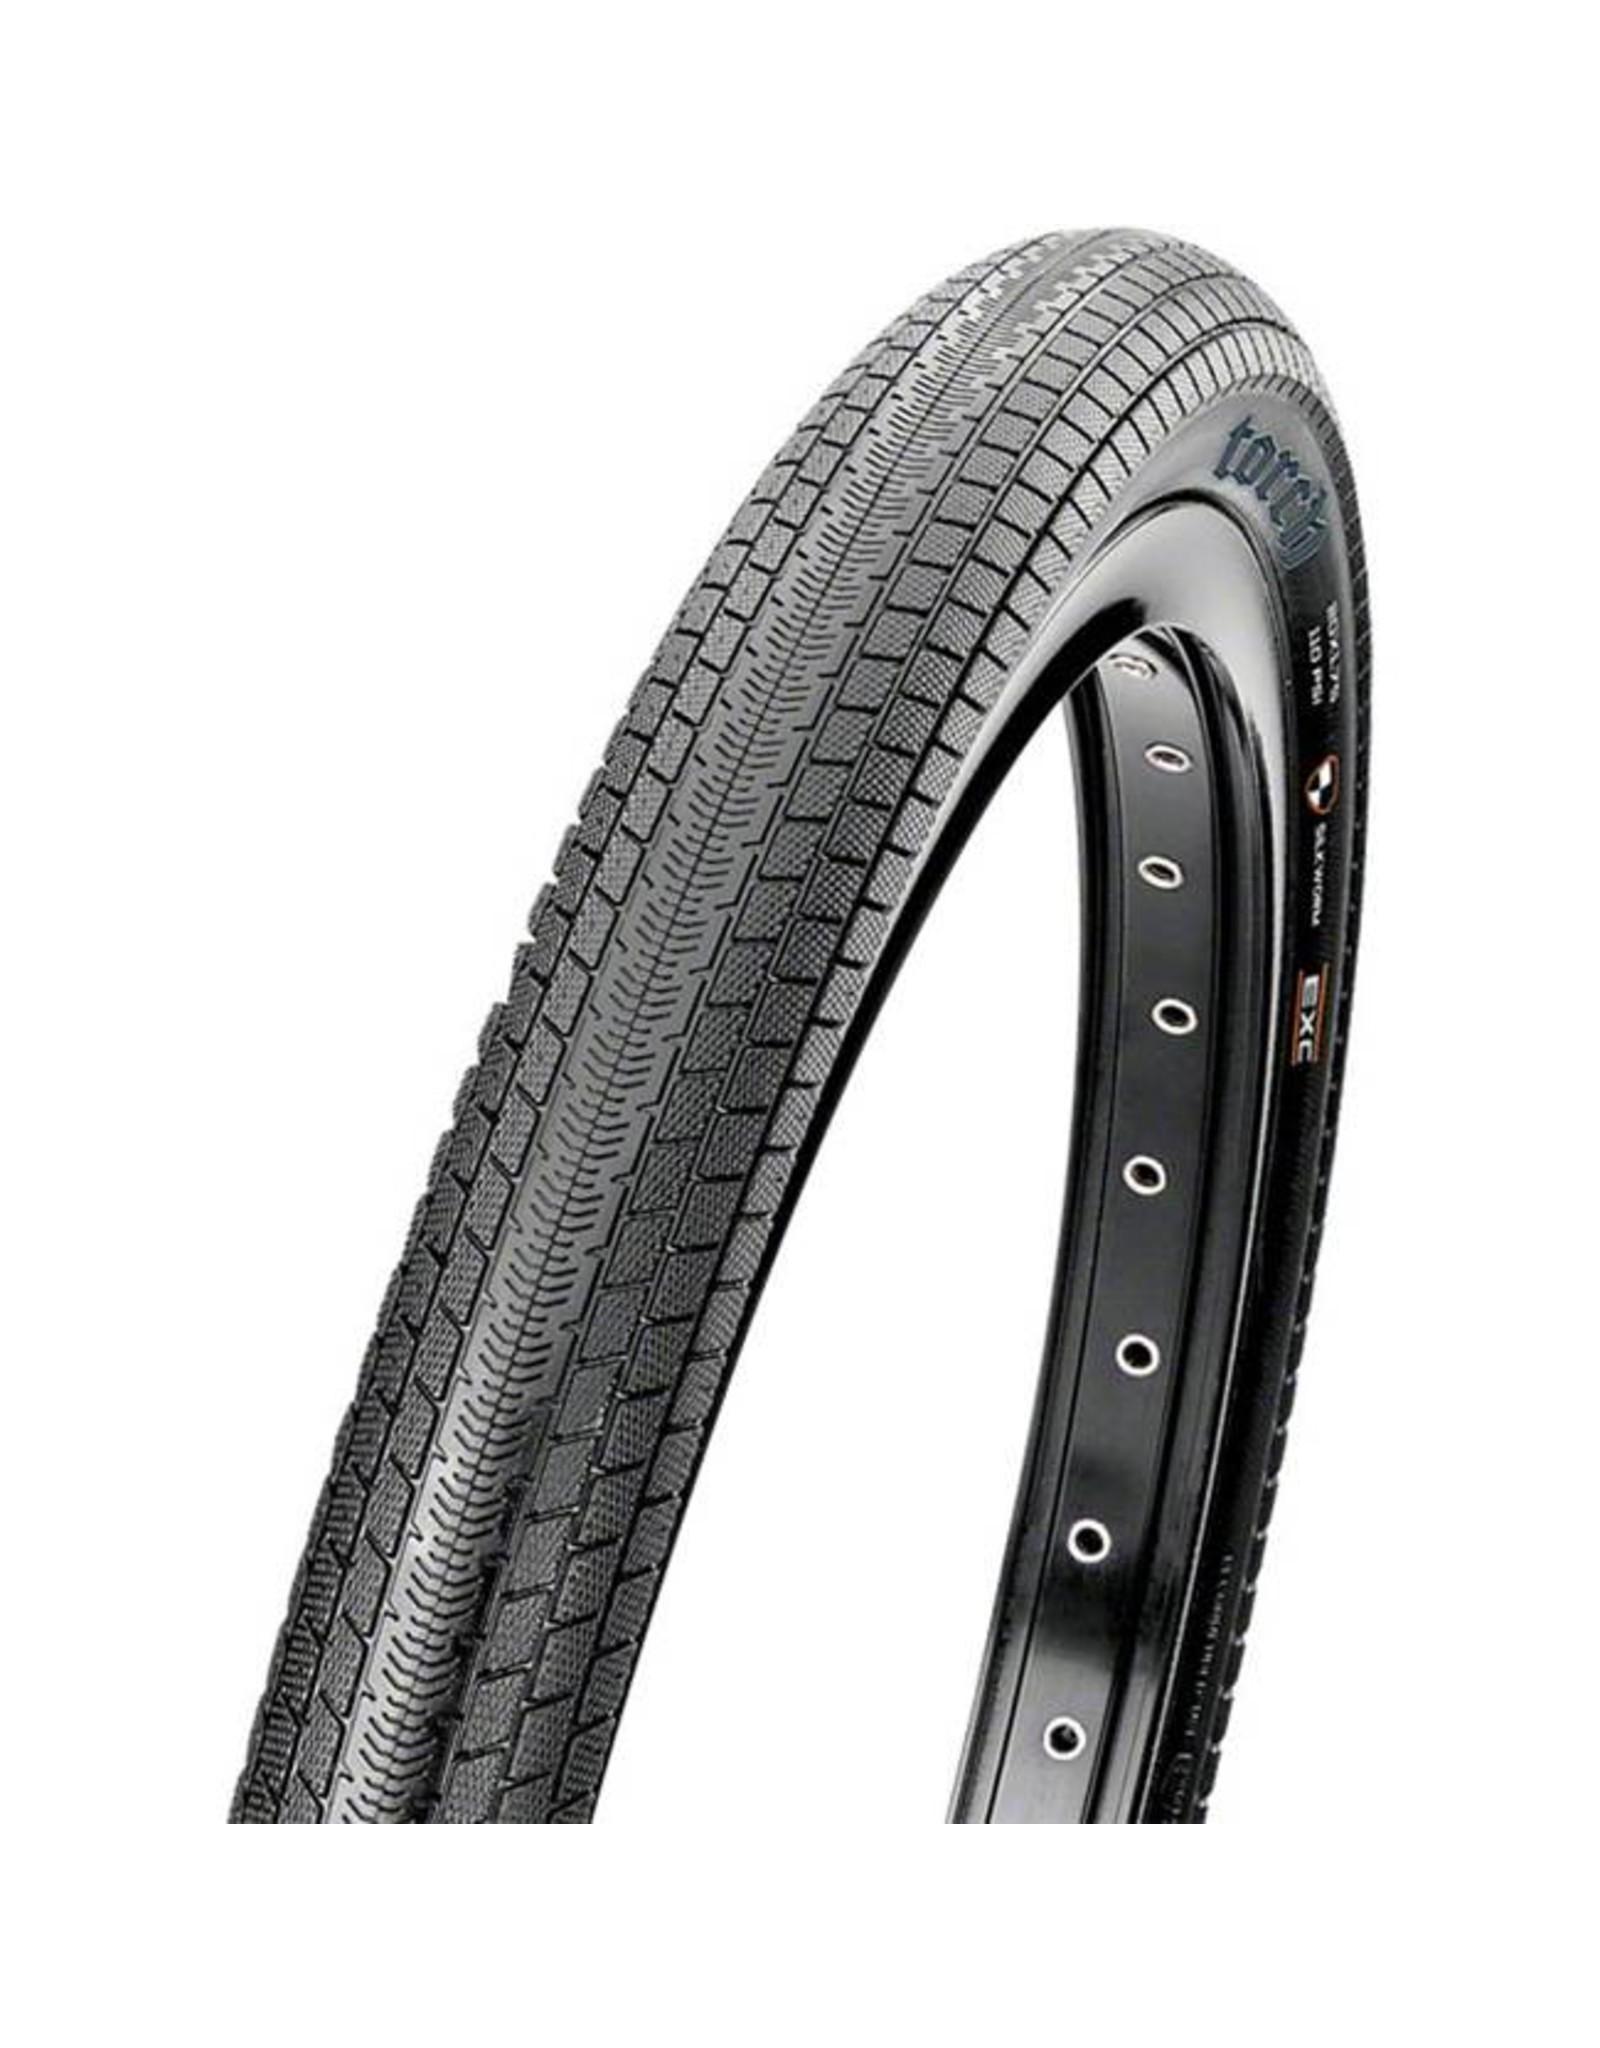 "Maxxis Maxxis Torch Tire: 20 x 1.75"", Folding, 120tpi, Dual Compound, SilkShield, Black"